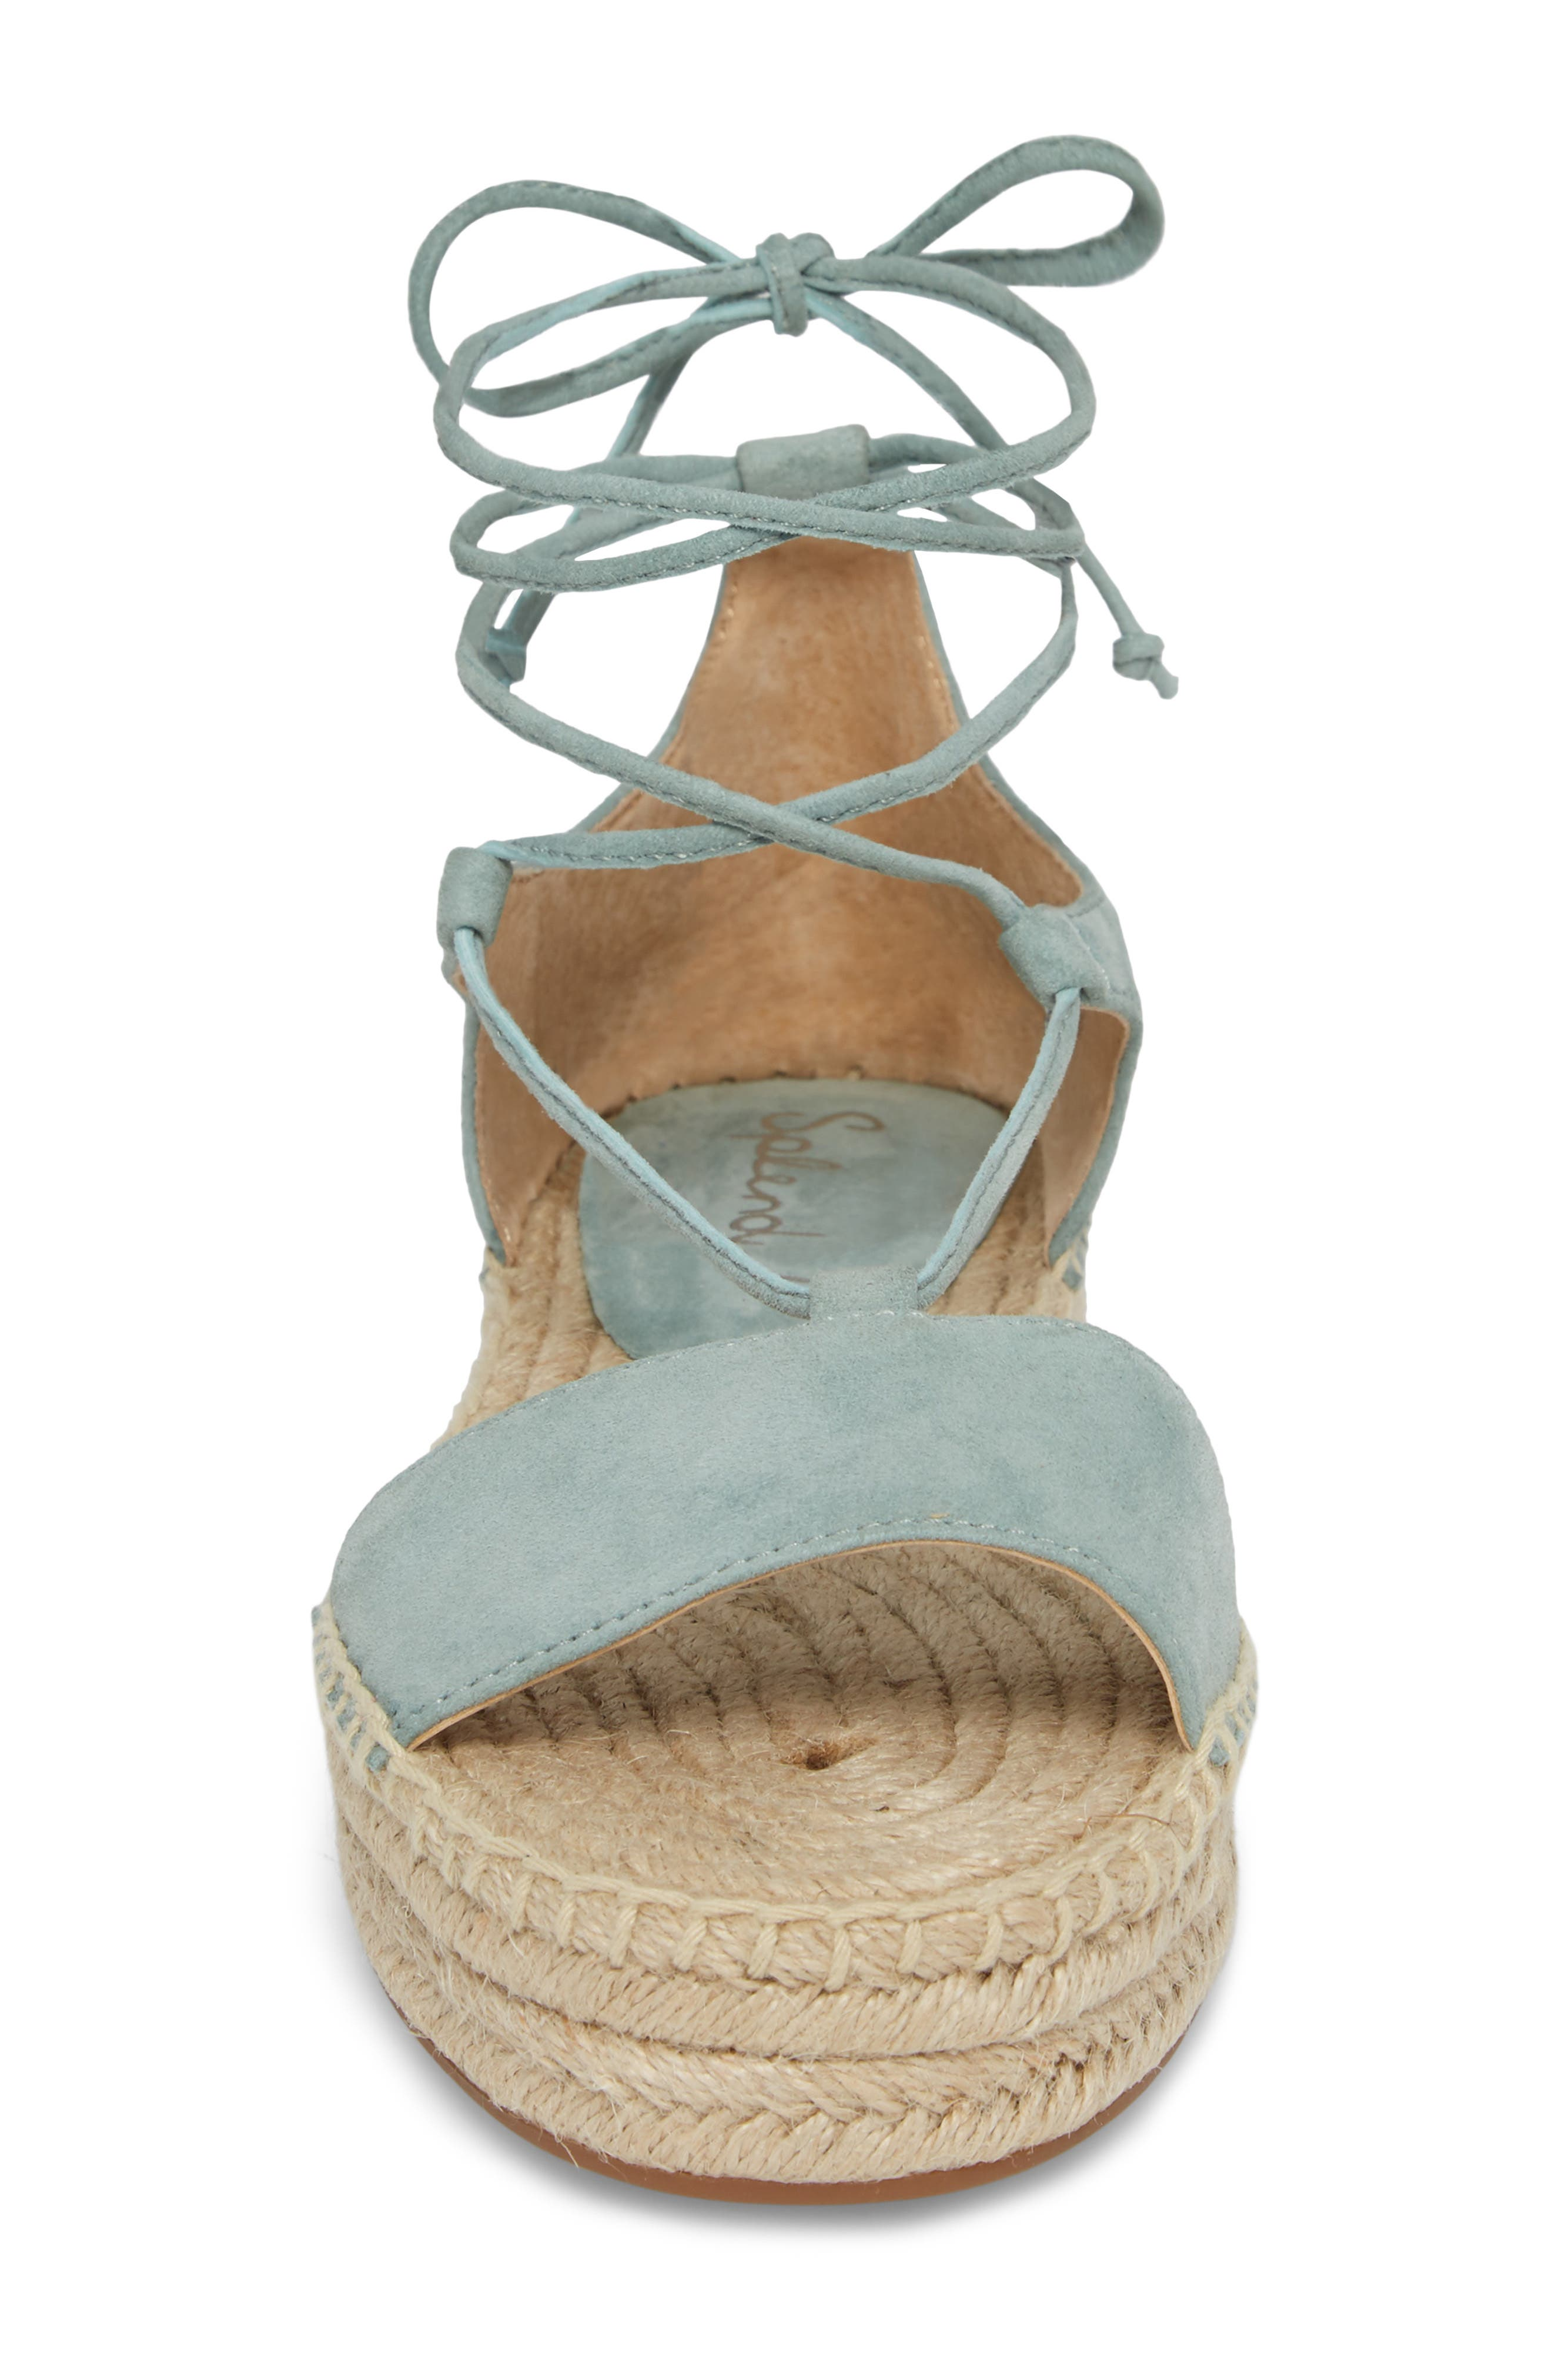 Fernanda Wraparound Platform Sandal,                             Alternate thumbnail 5, color,                             Deco Green Suede